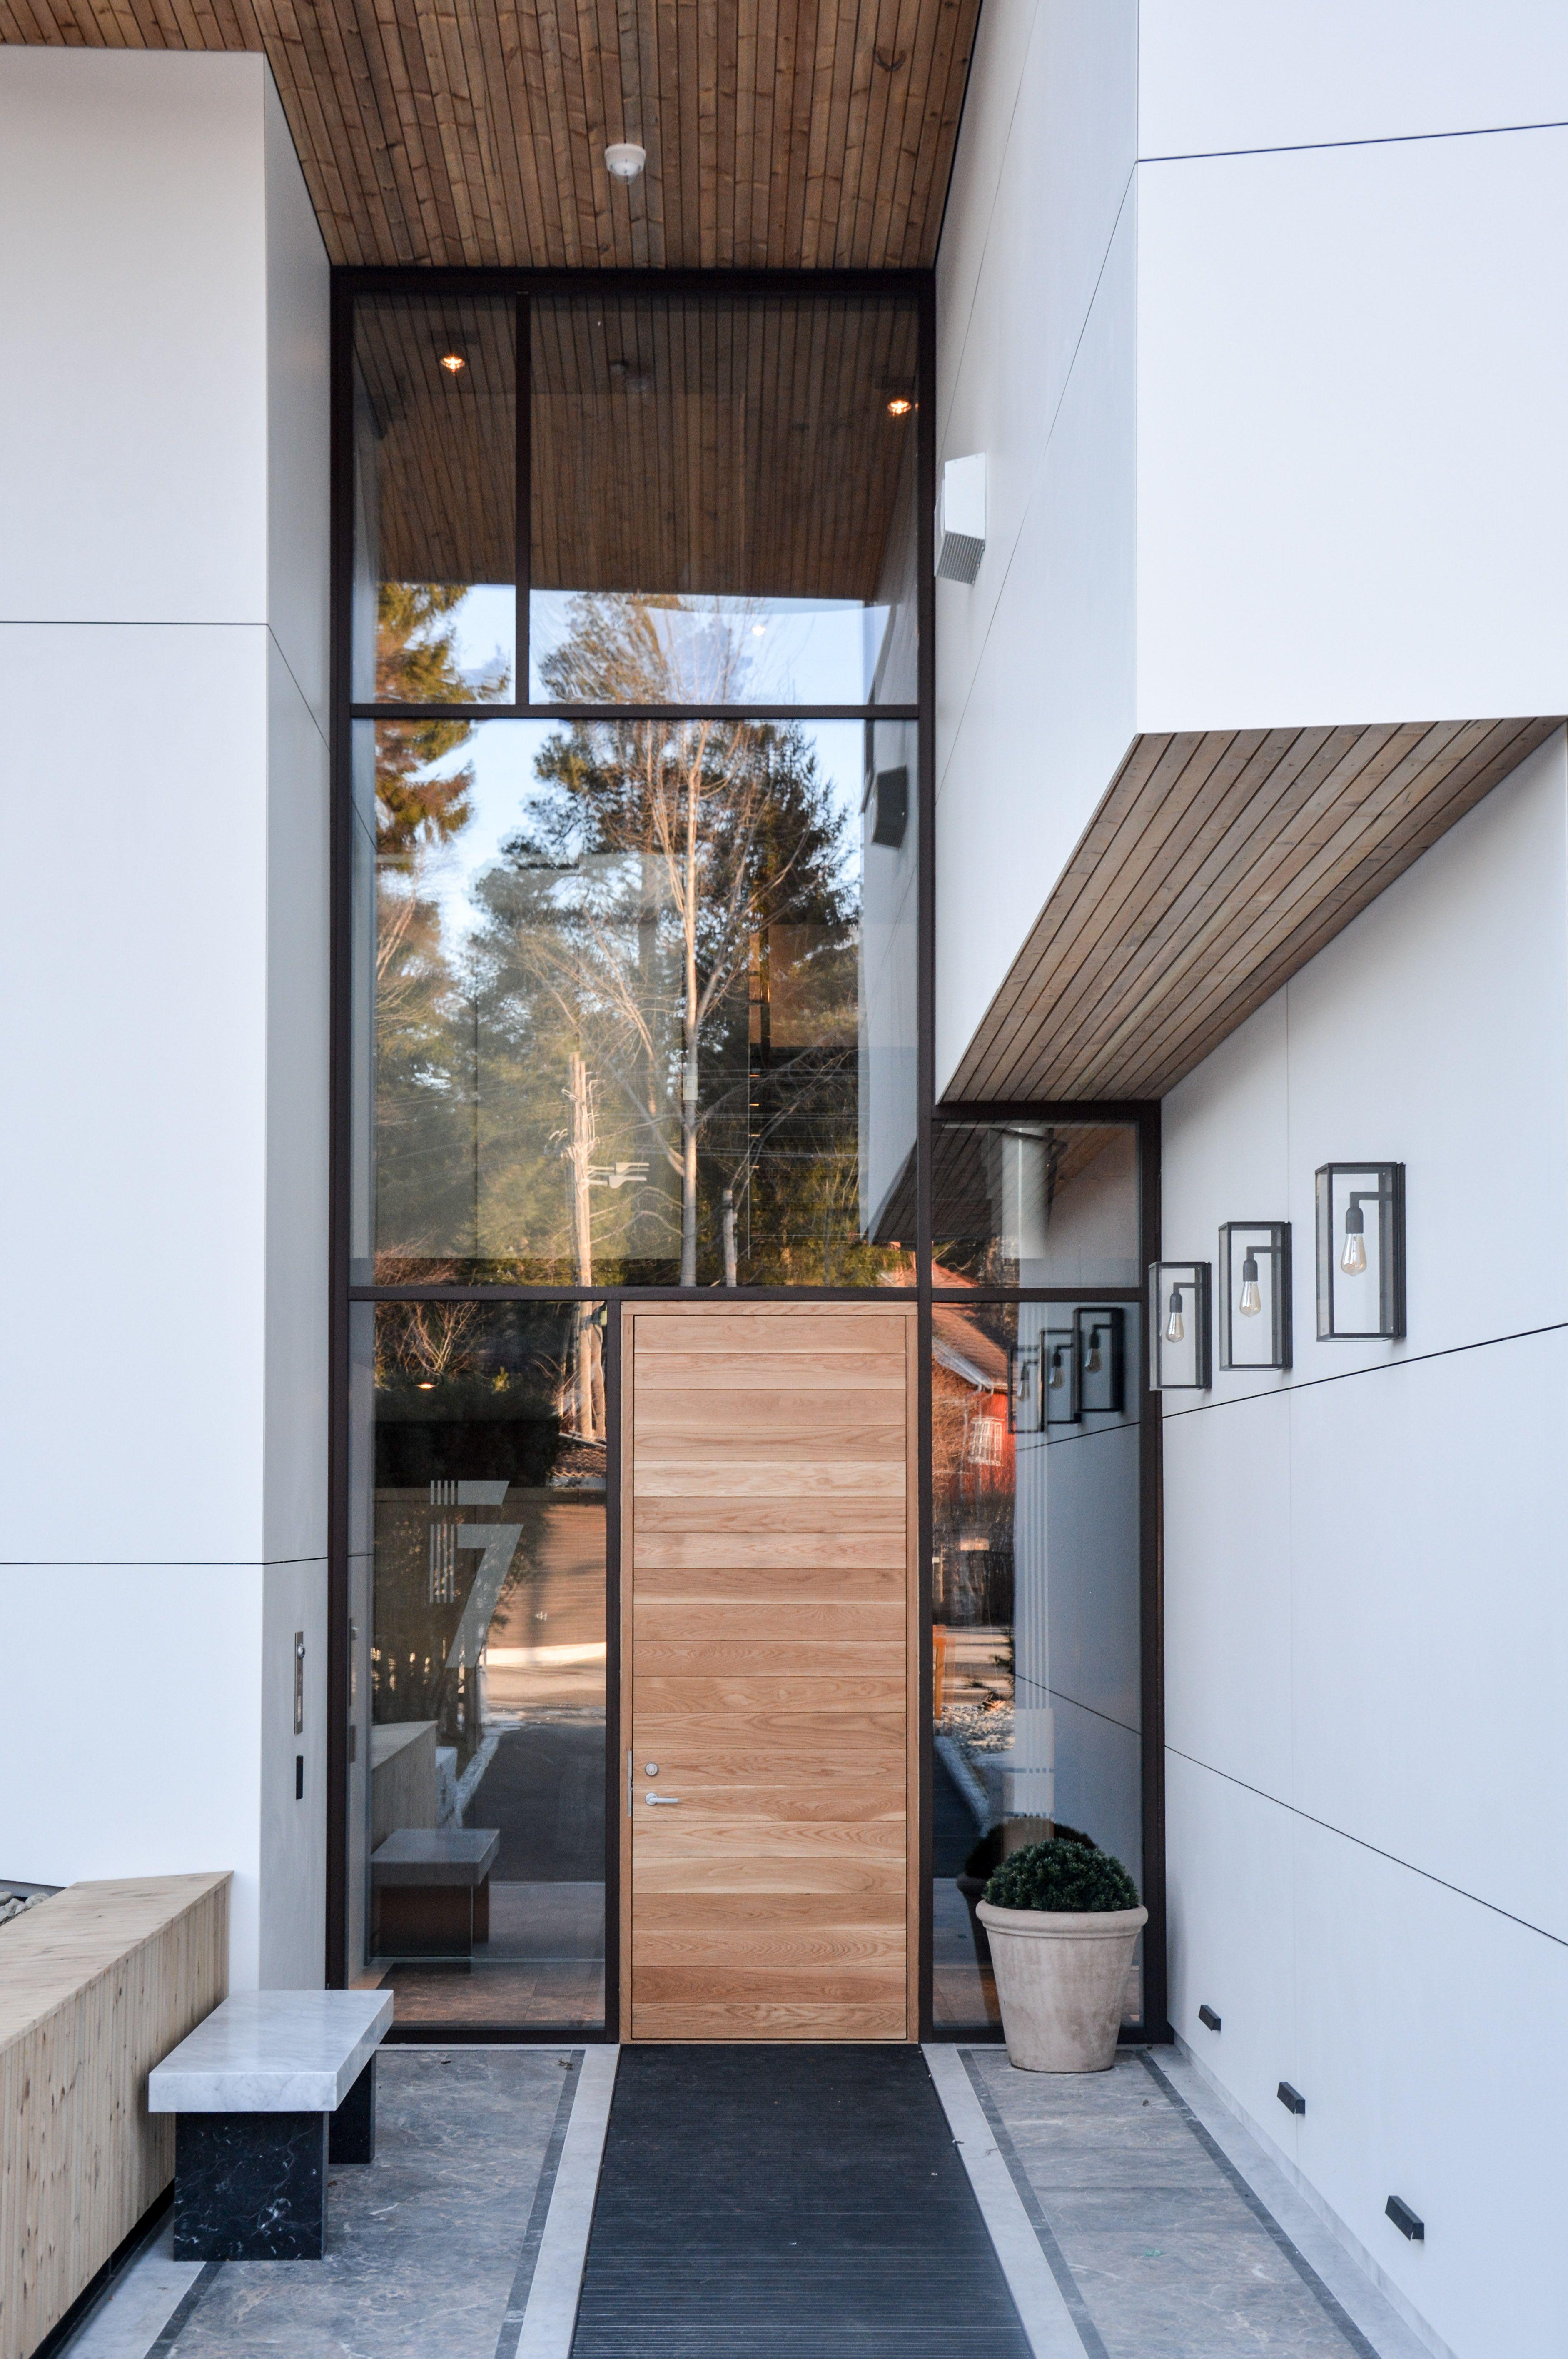 Norwegian apartment complex by various architects modern scandinavian architecture main entrance design